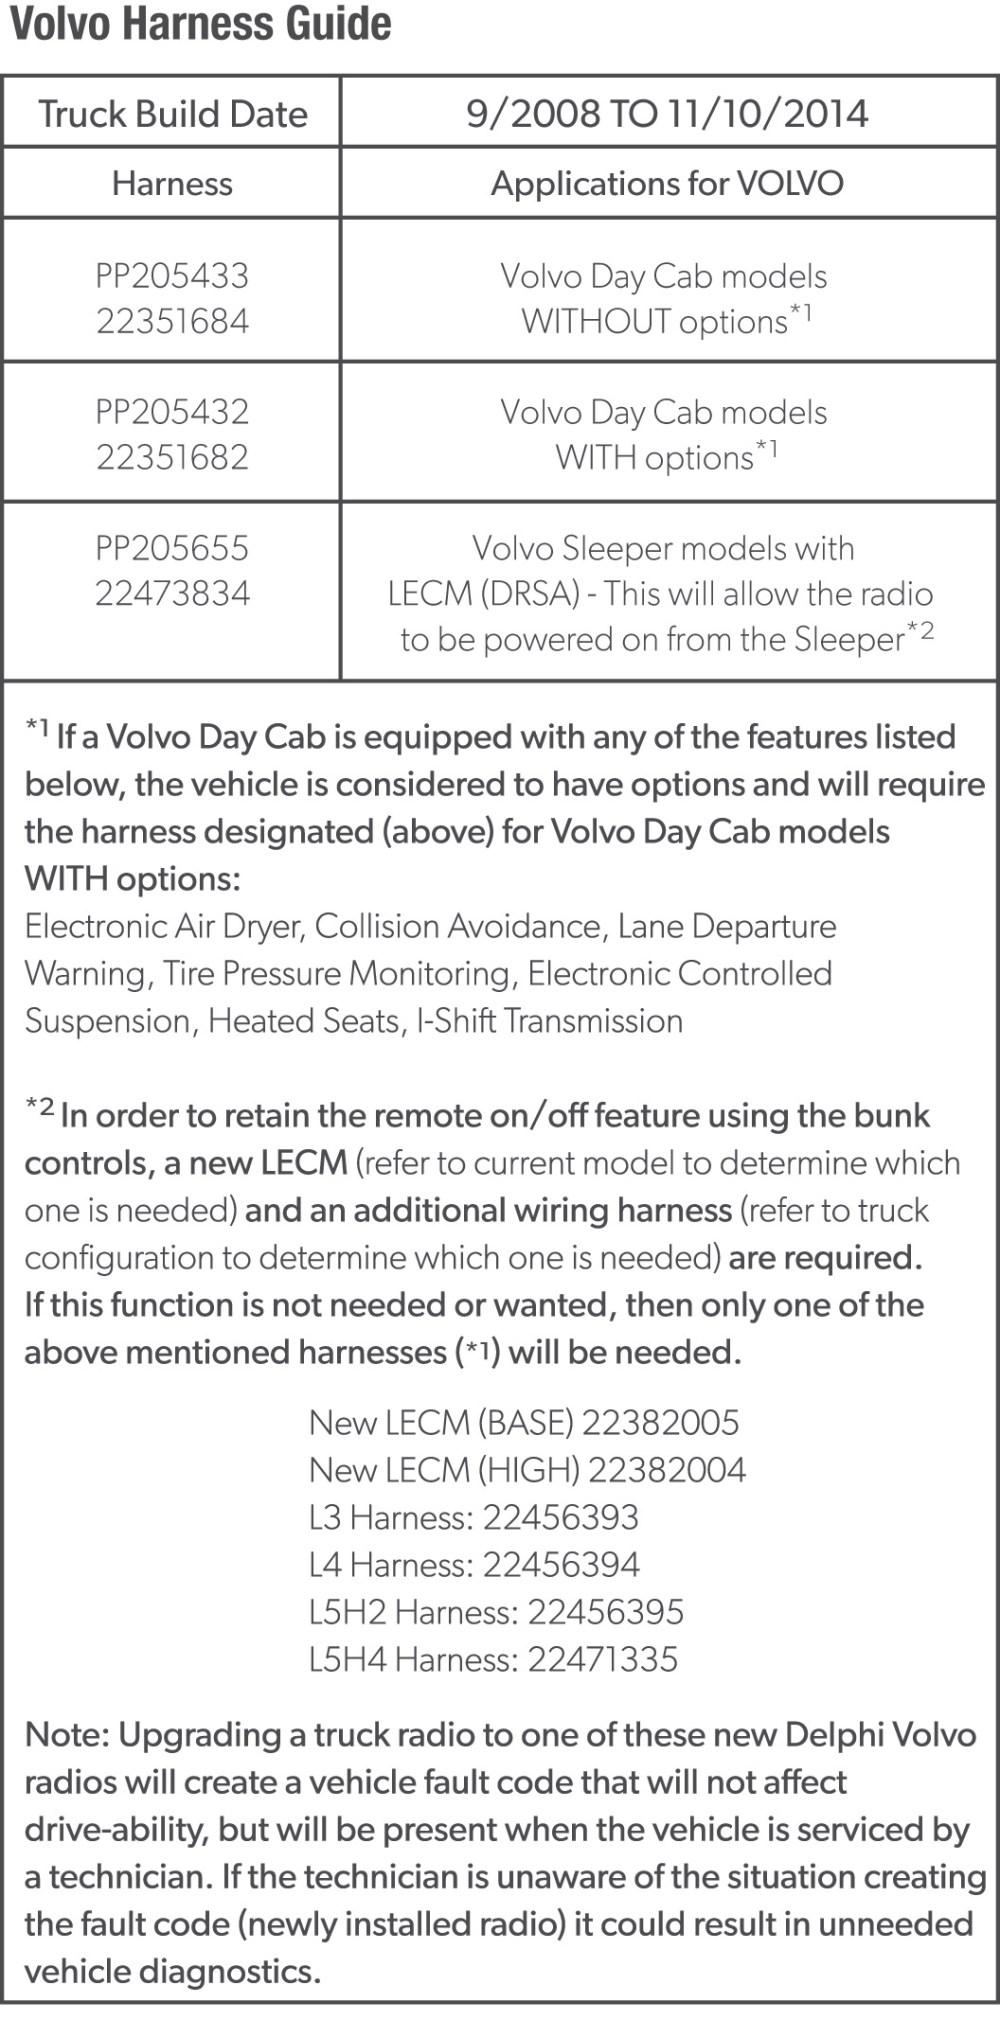 medium resolution of volvo radio harness guide